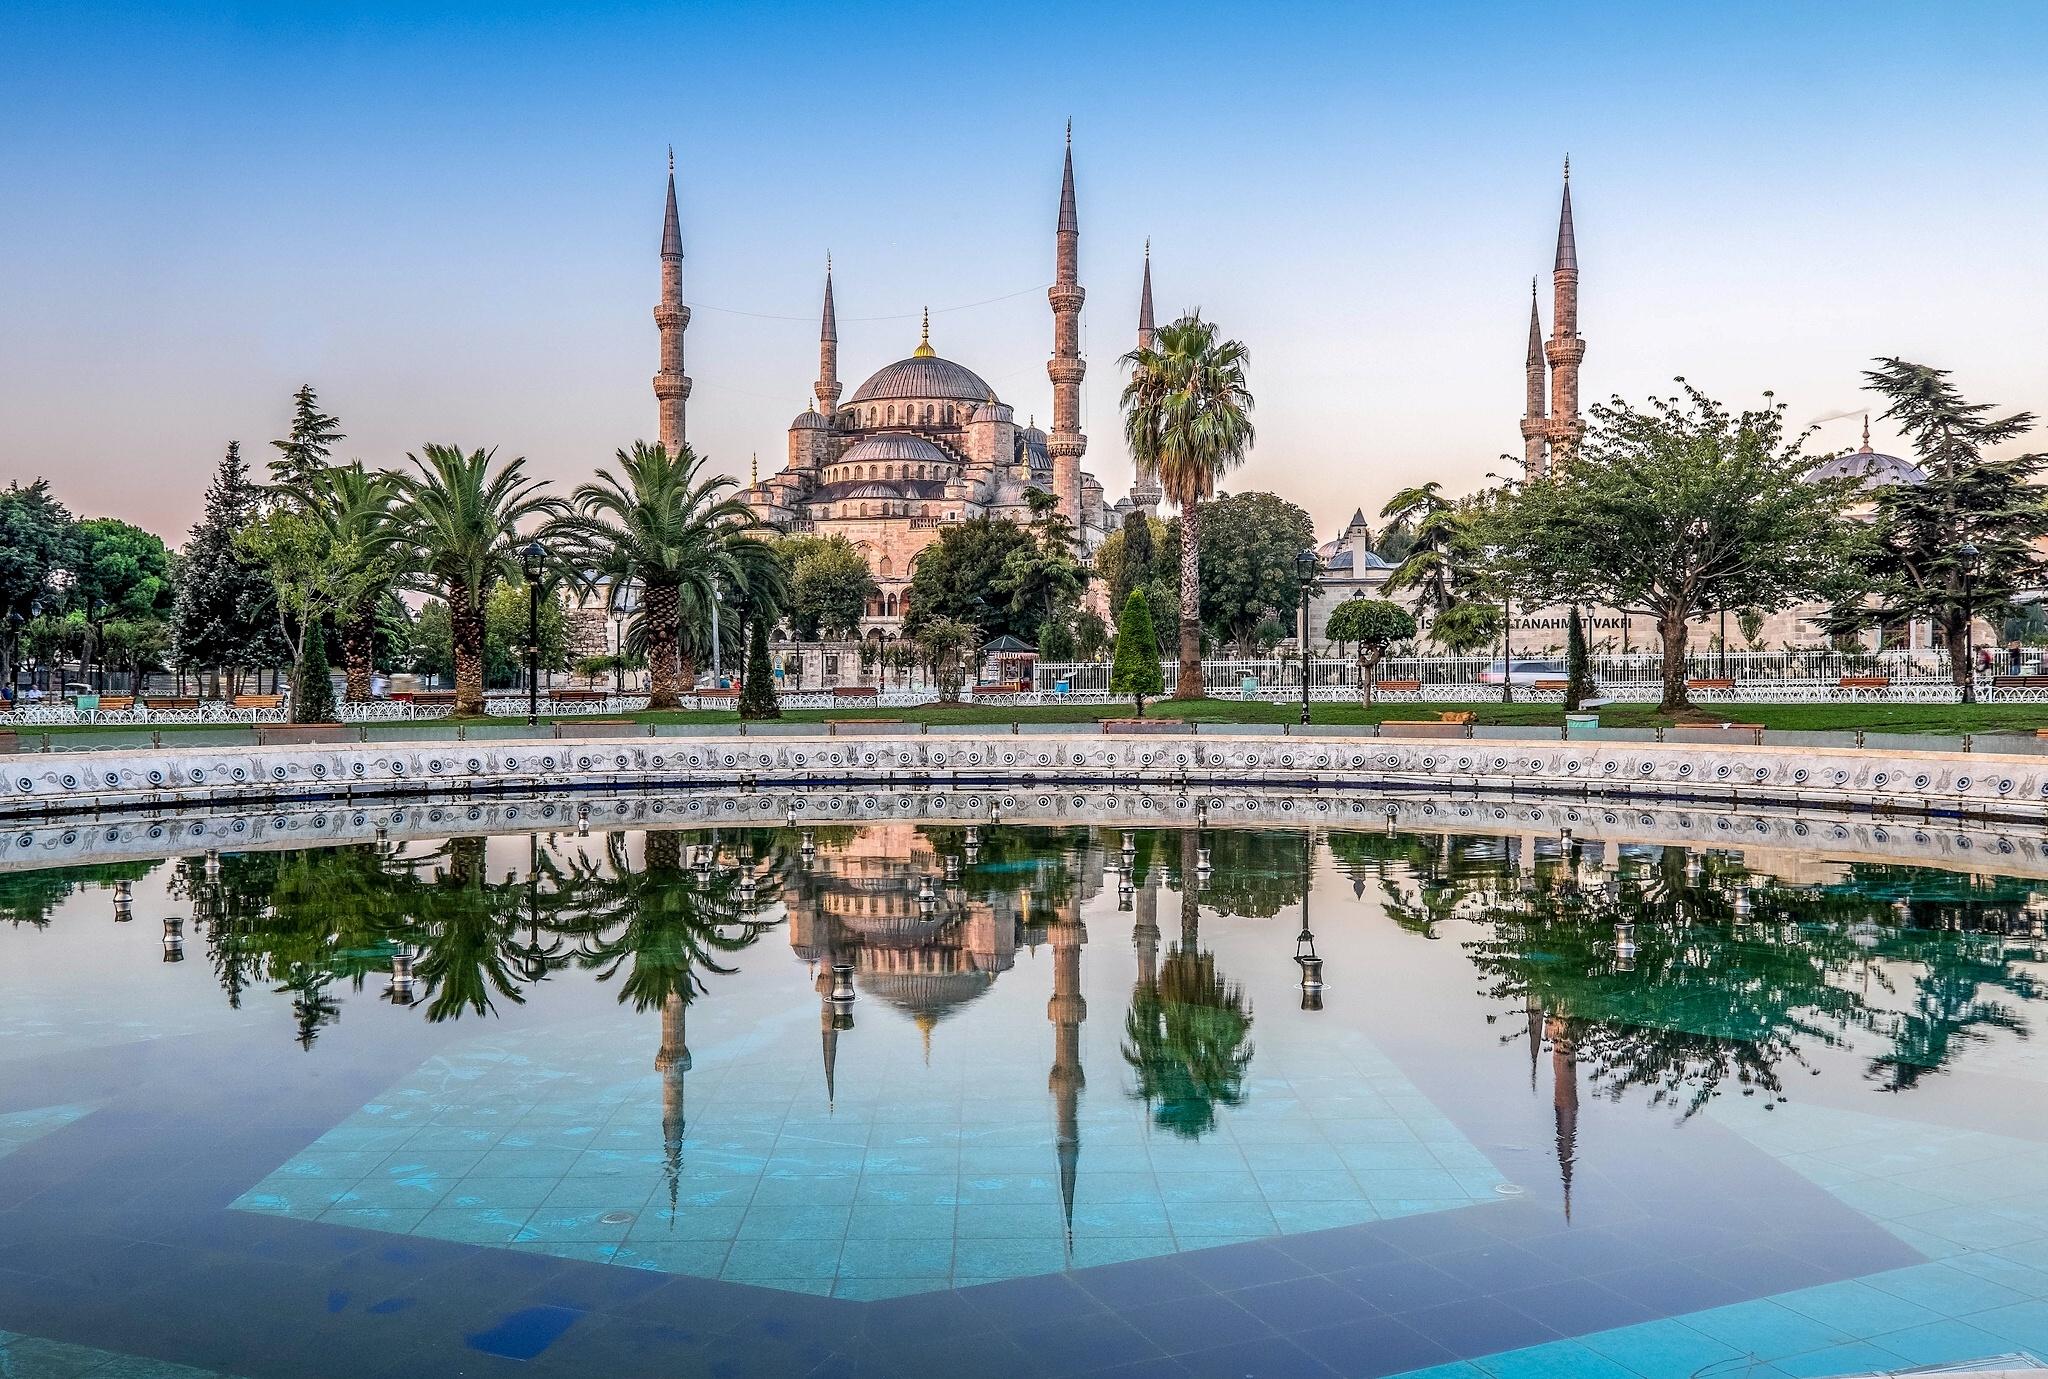 Blue Mosque sultan ahmet mosque Istanbul Turkey 1008022